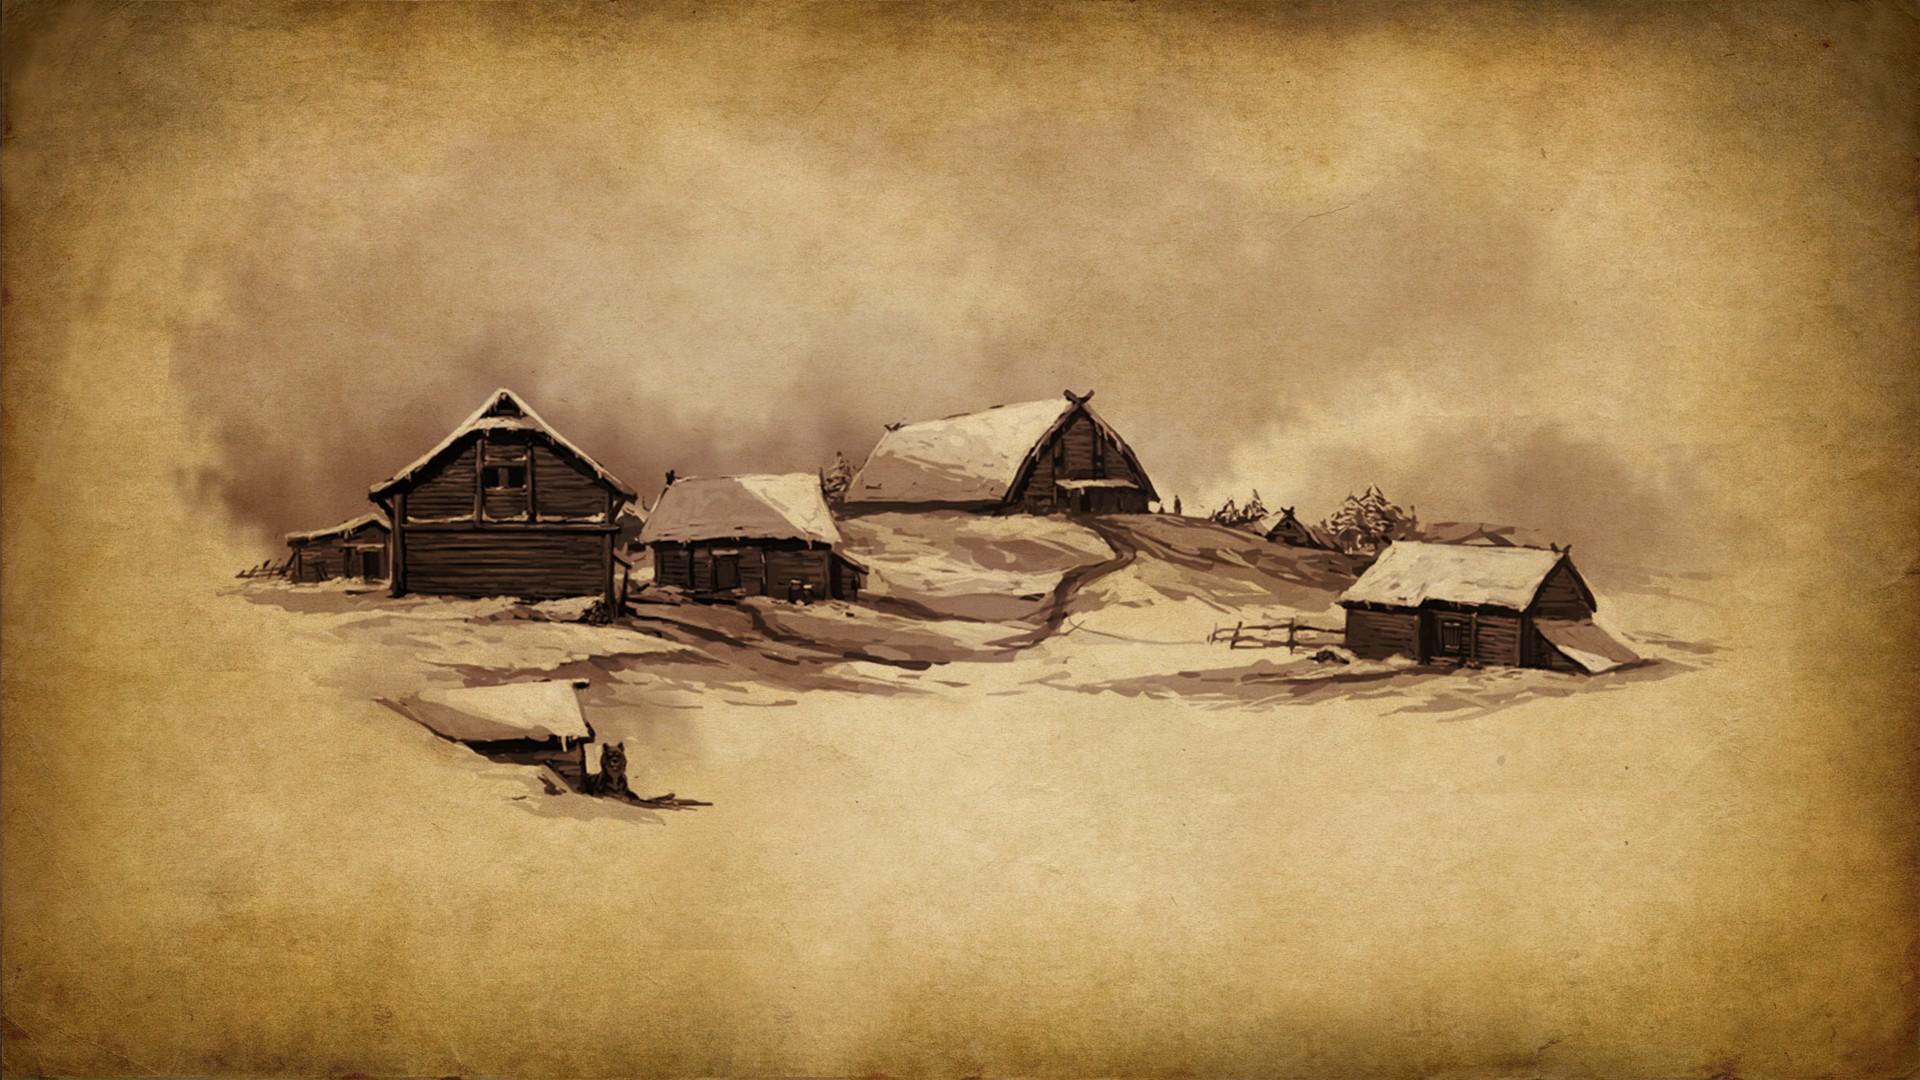 General 1920x1080 fantasy art Mount & Blade painting artwork beige village